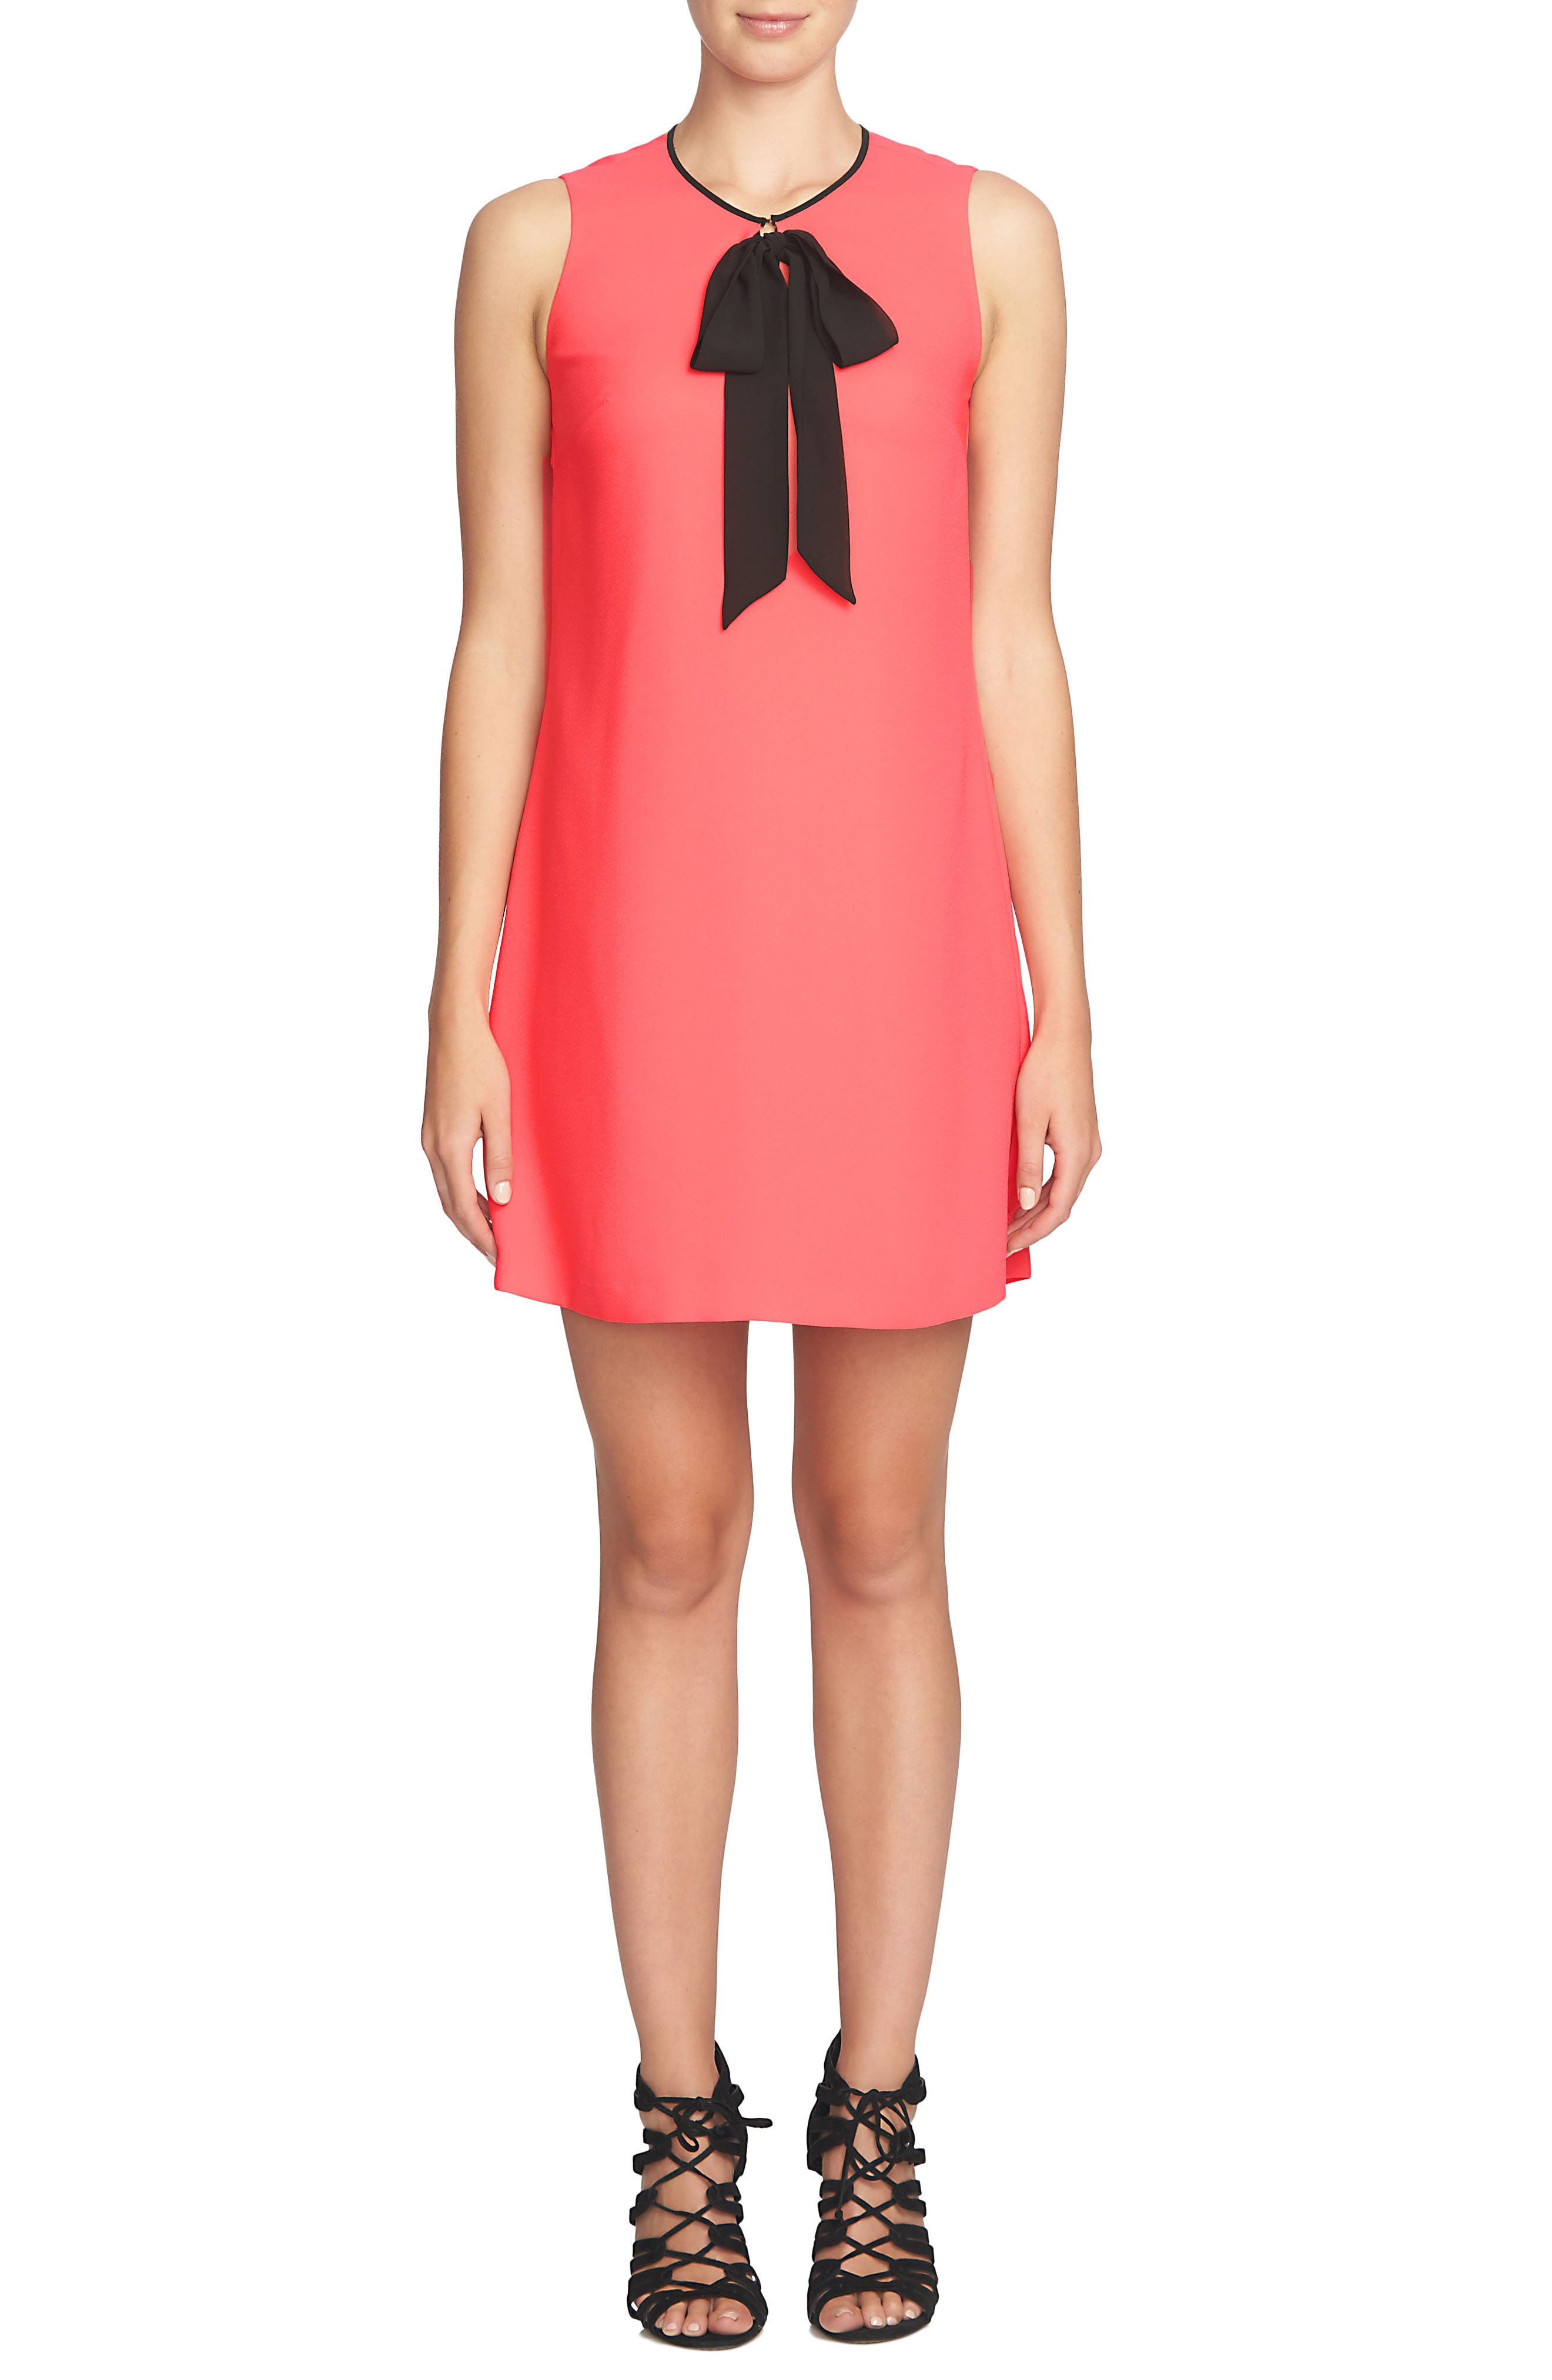 Alternate Image 1 Selected - Cece Rosie Tie Neck Dress